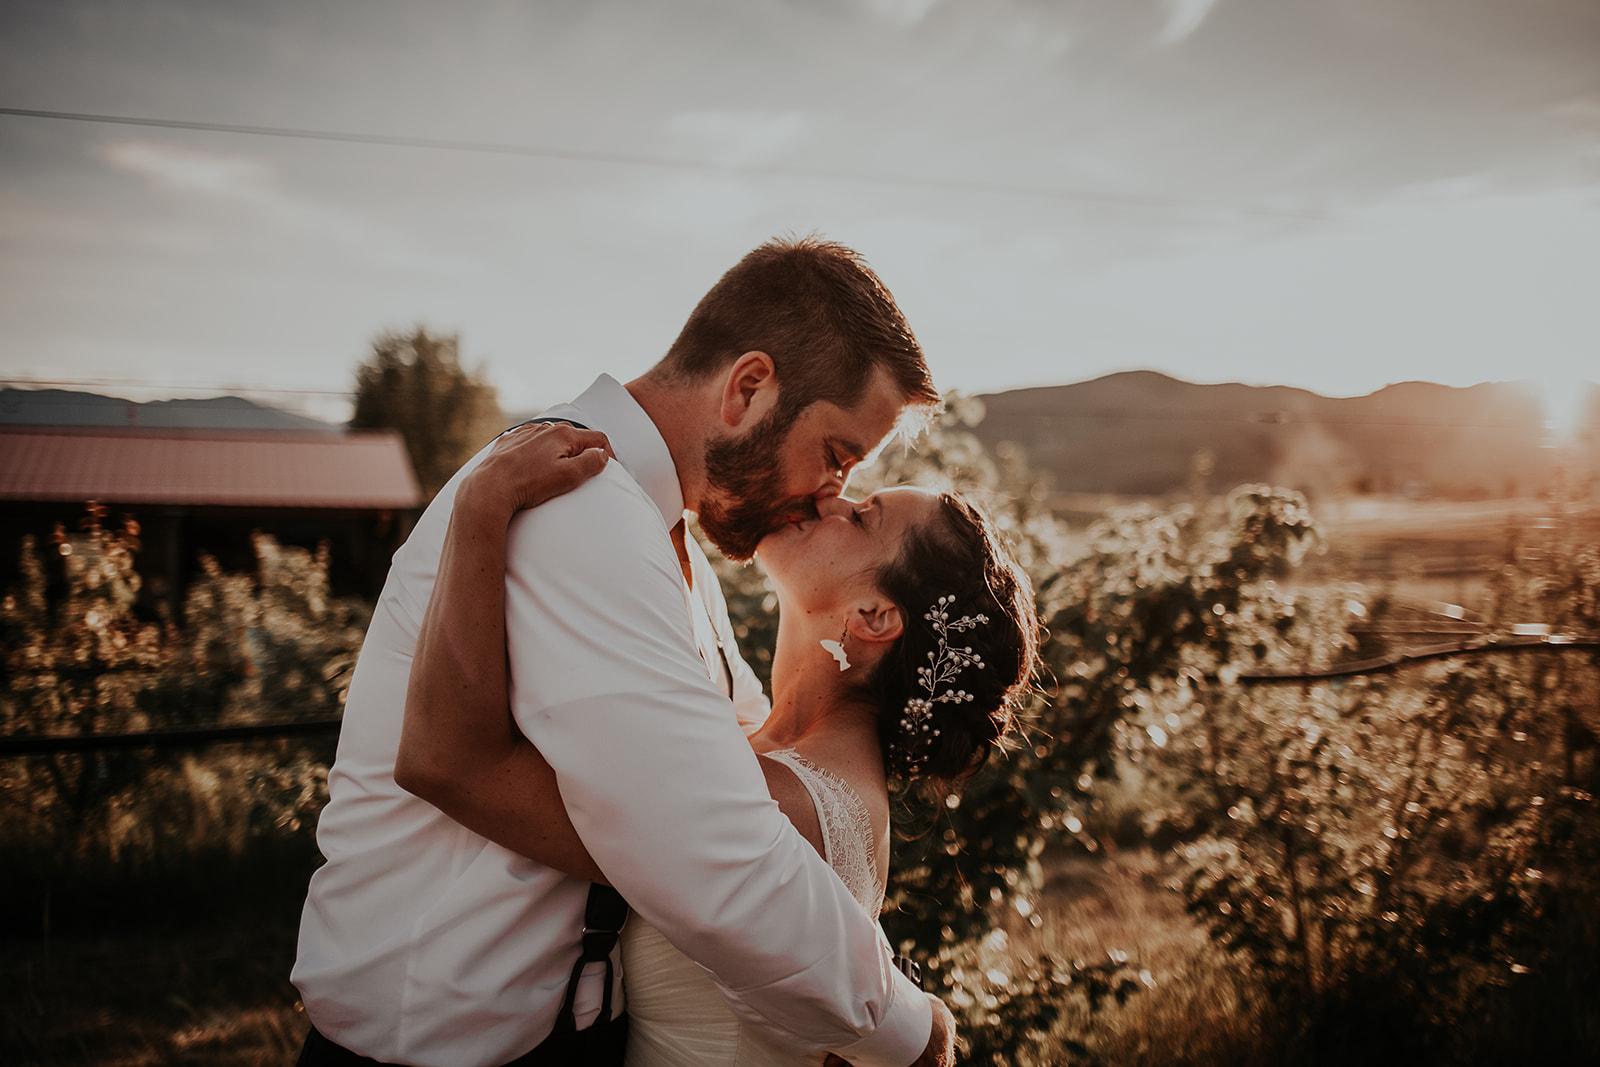 north-cascades-elopement-wedding-winthrop-wedding-photographer-megan-gallagher-photography (31).jpg